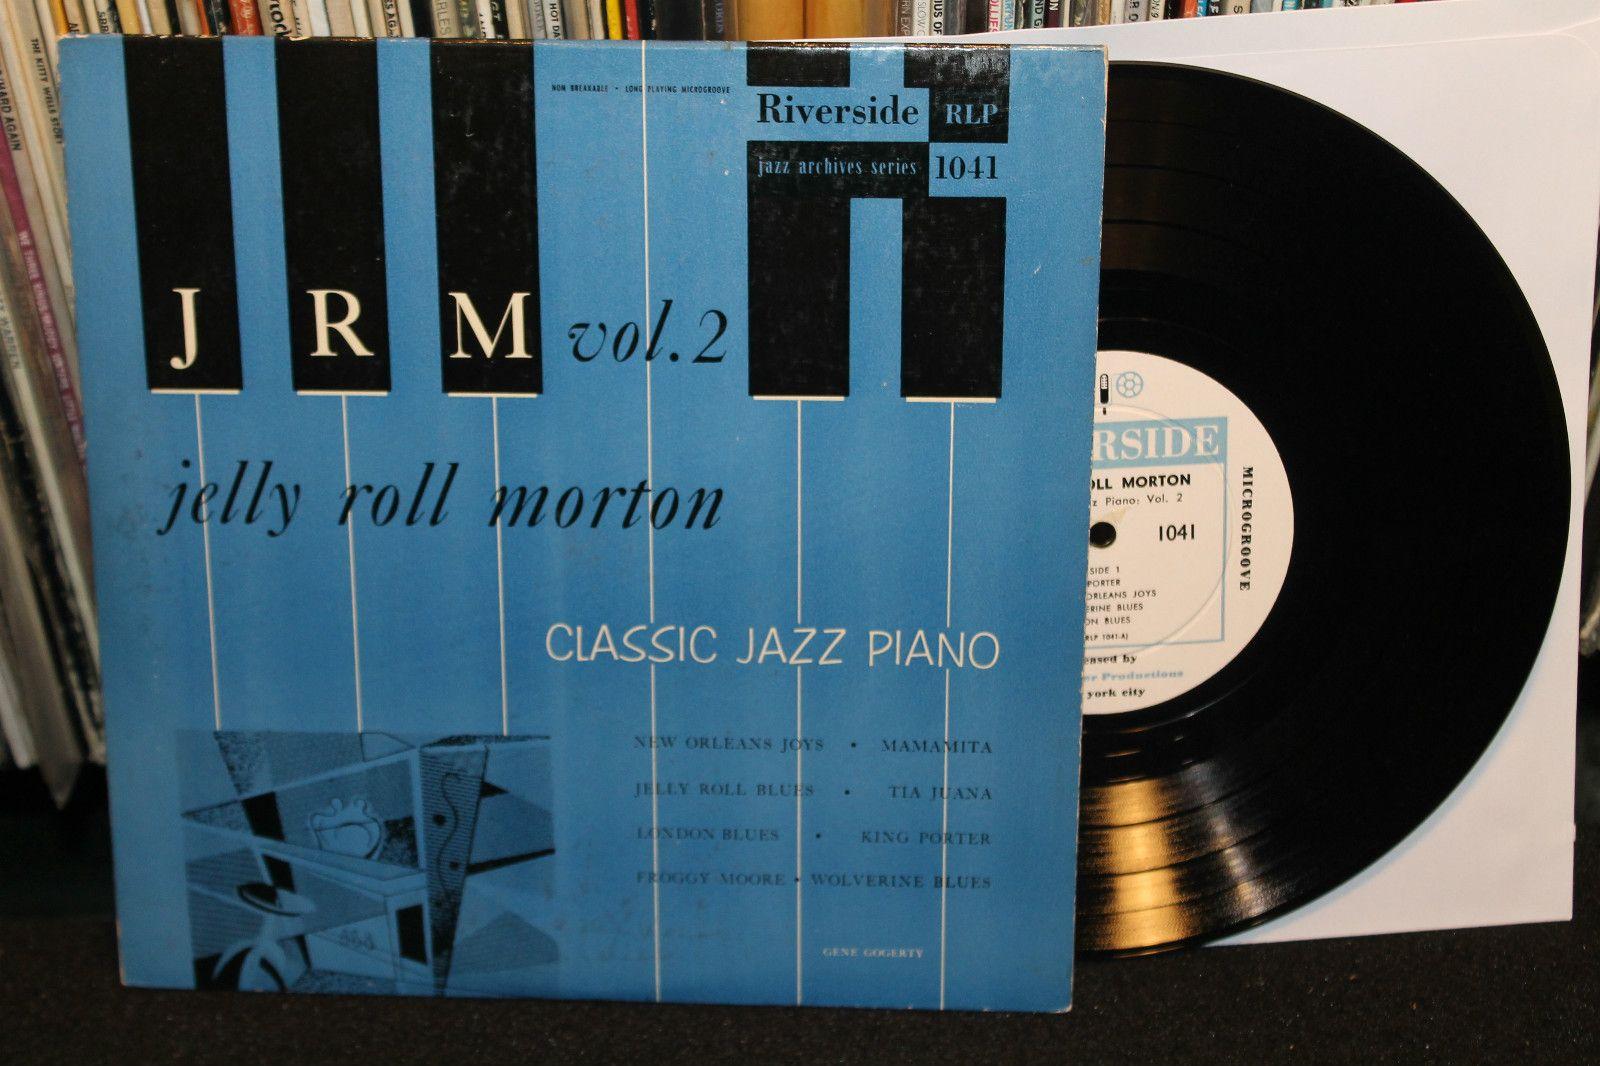 Jelly Roll Morton Classic Jazz Piano Volume 2 Original On Riverside Records 1954 10 Ep Vinyl Jelly Roll Morton Classic Jazz Jazz Piano